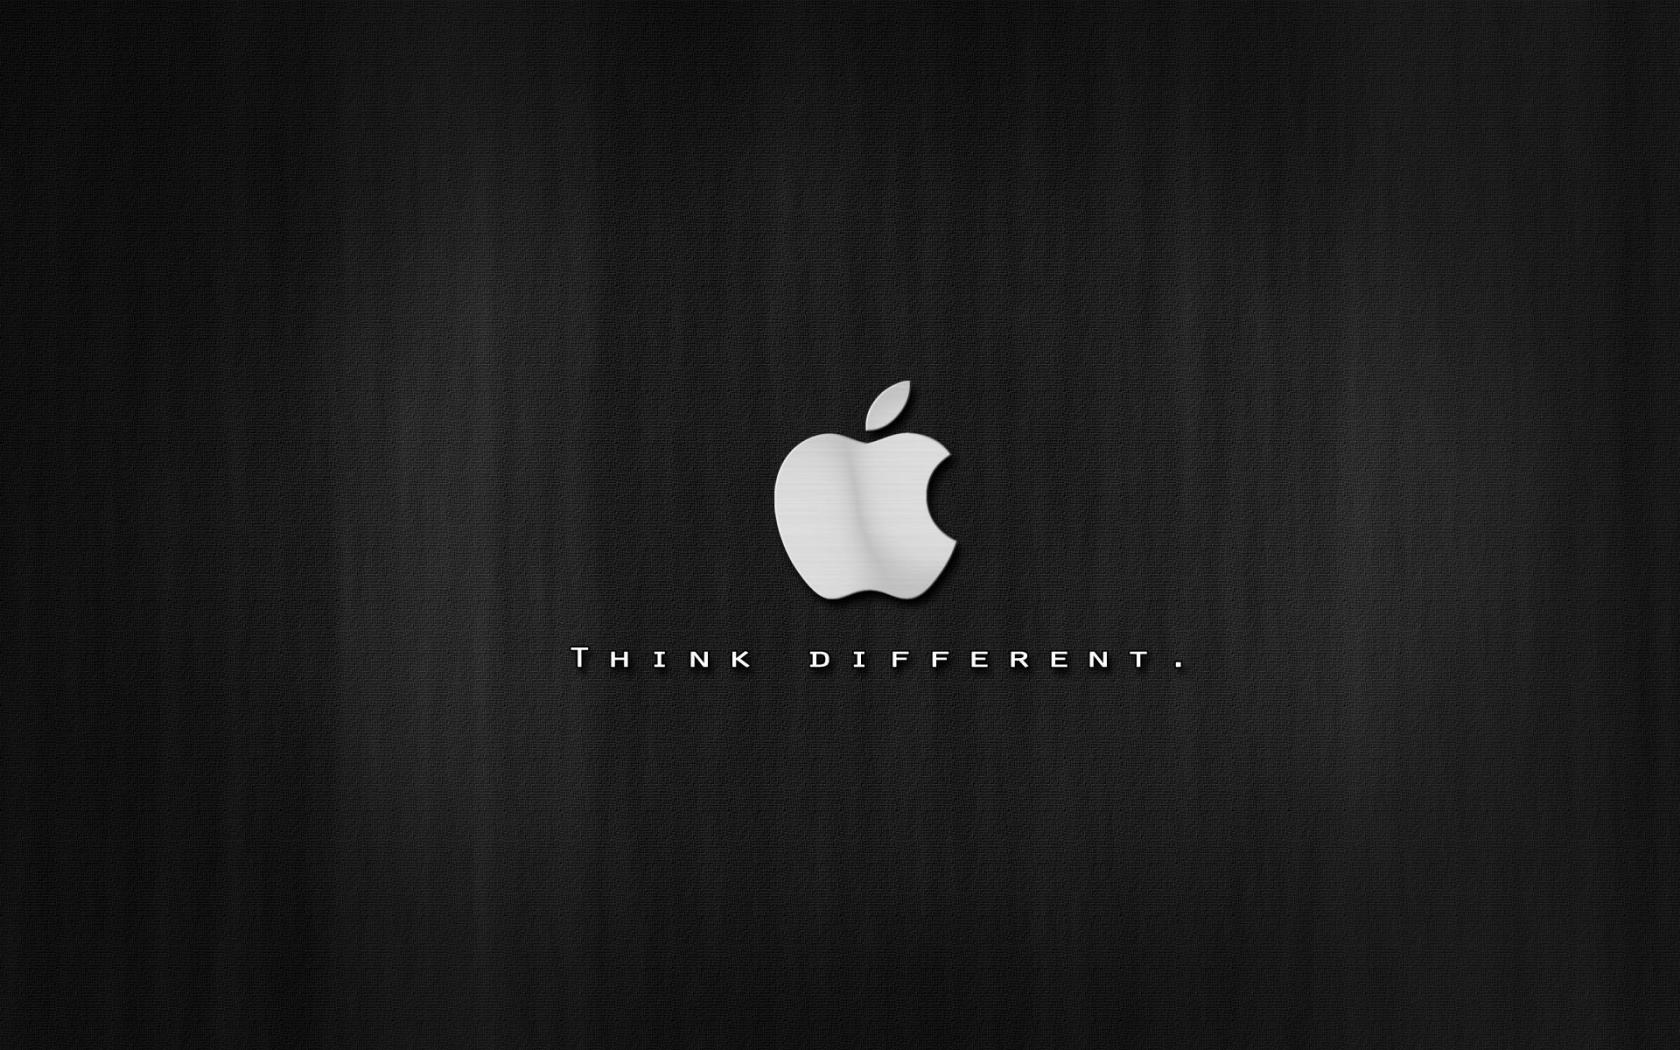 Название apple размер 1680x1050